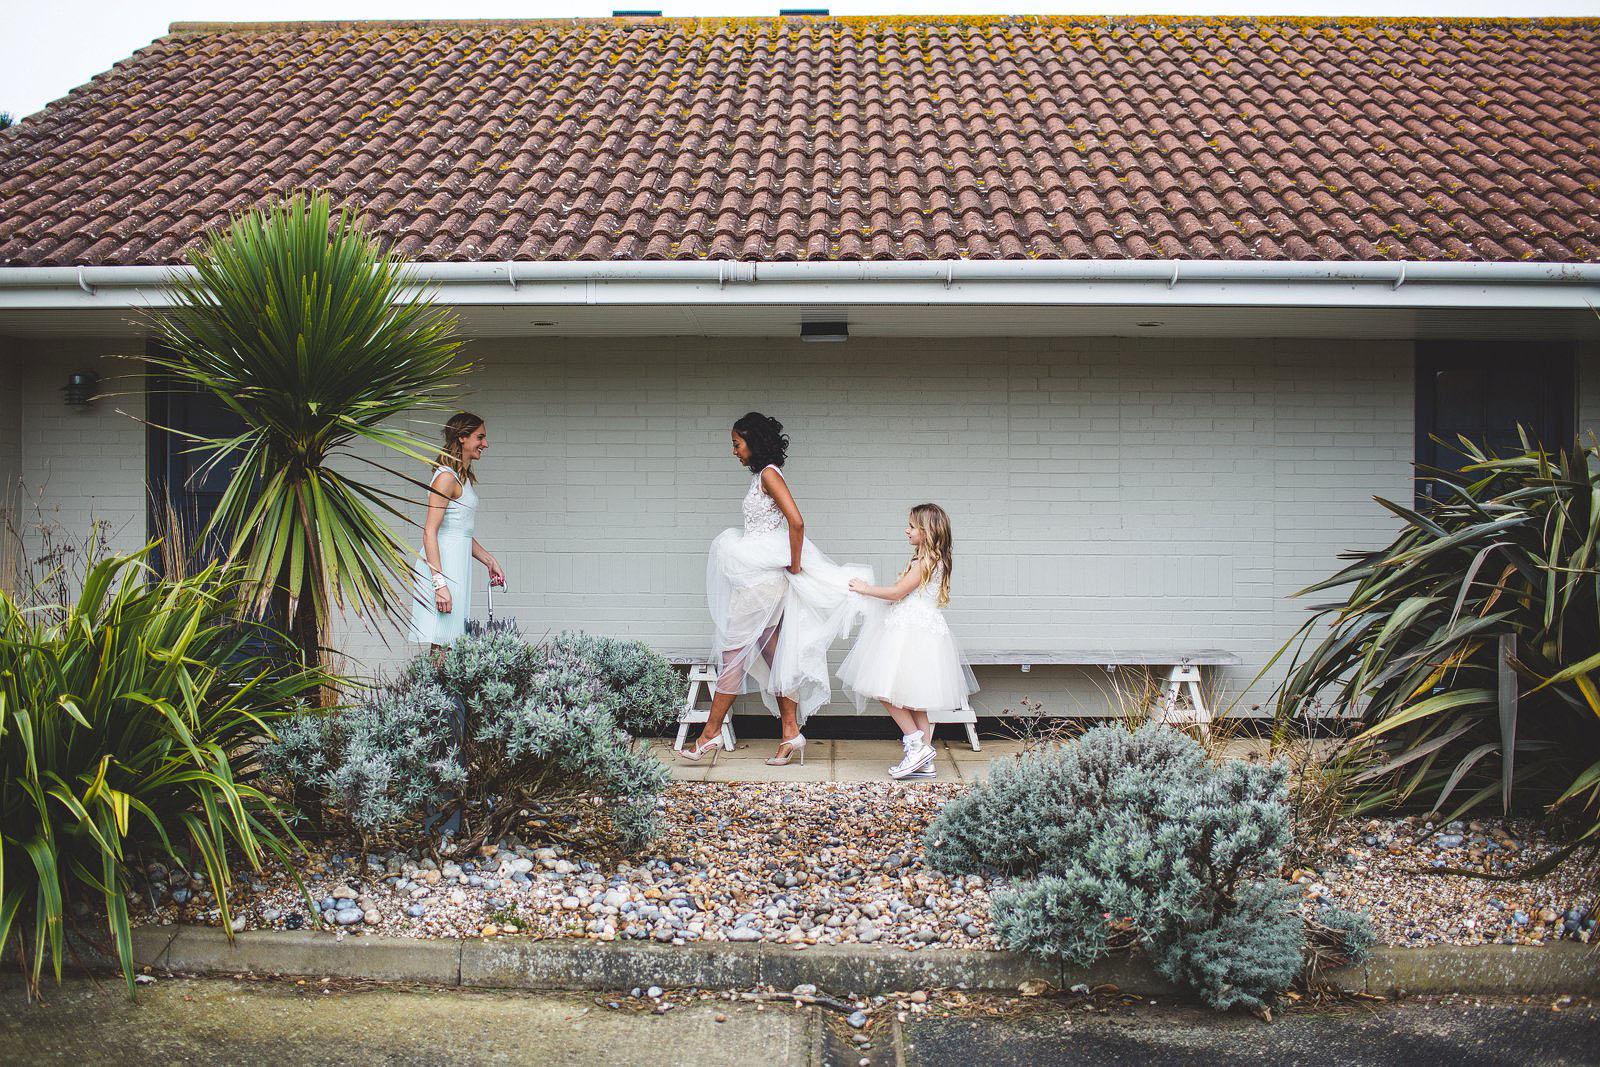 Camber sands wedding venue